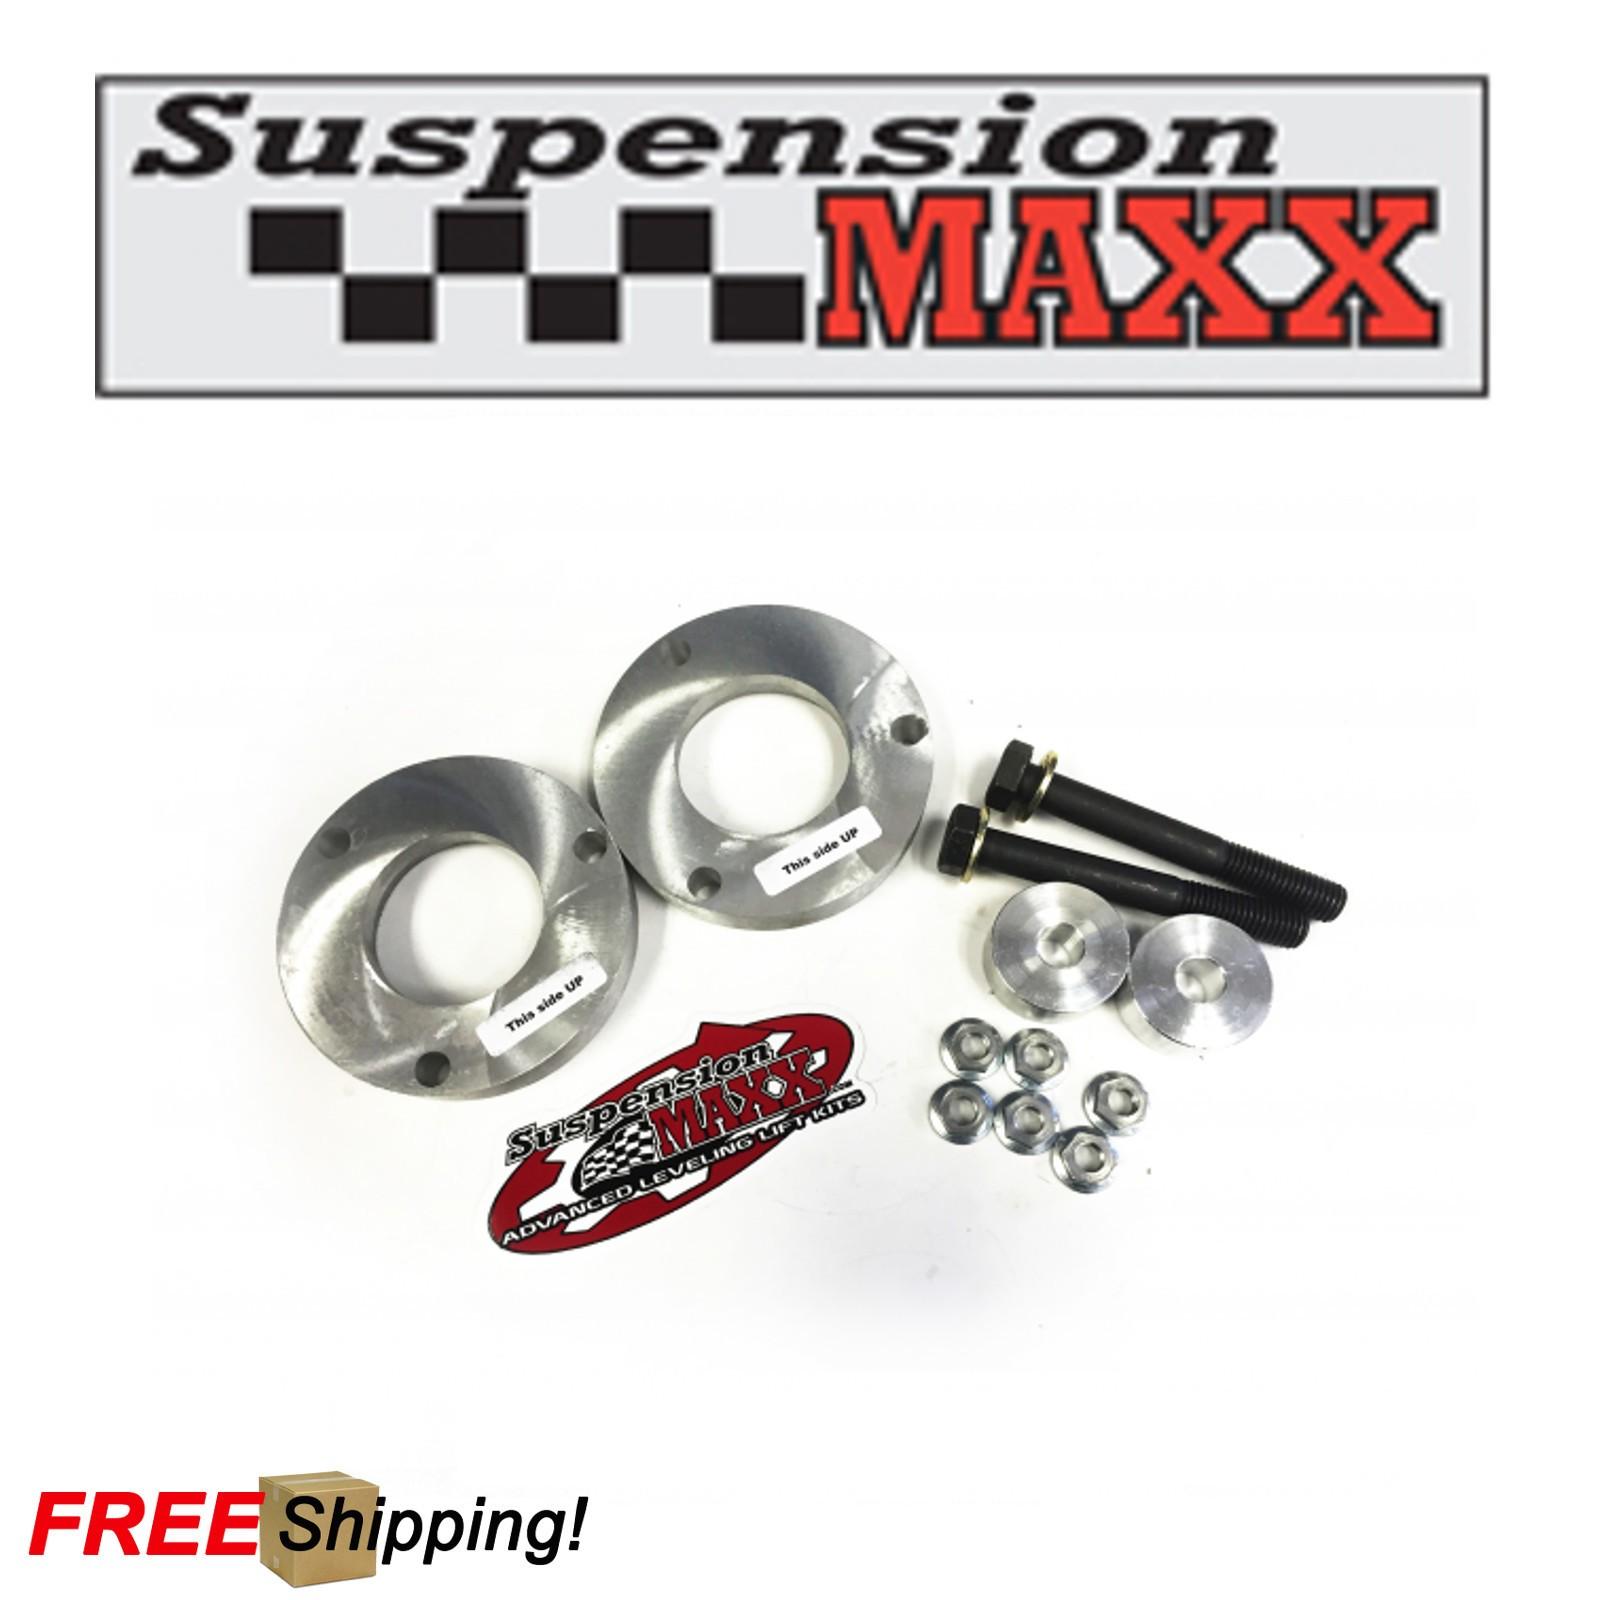 "Suspension Maxx MAXXStak 1.5/"" Front Level Kit For 2002-2009 GMC Envoy 2WD 4WD"